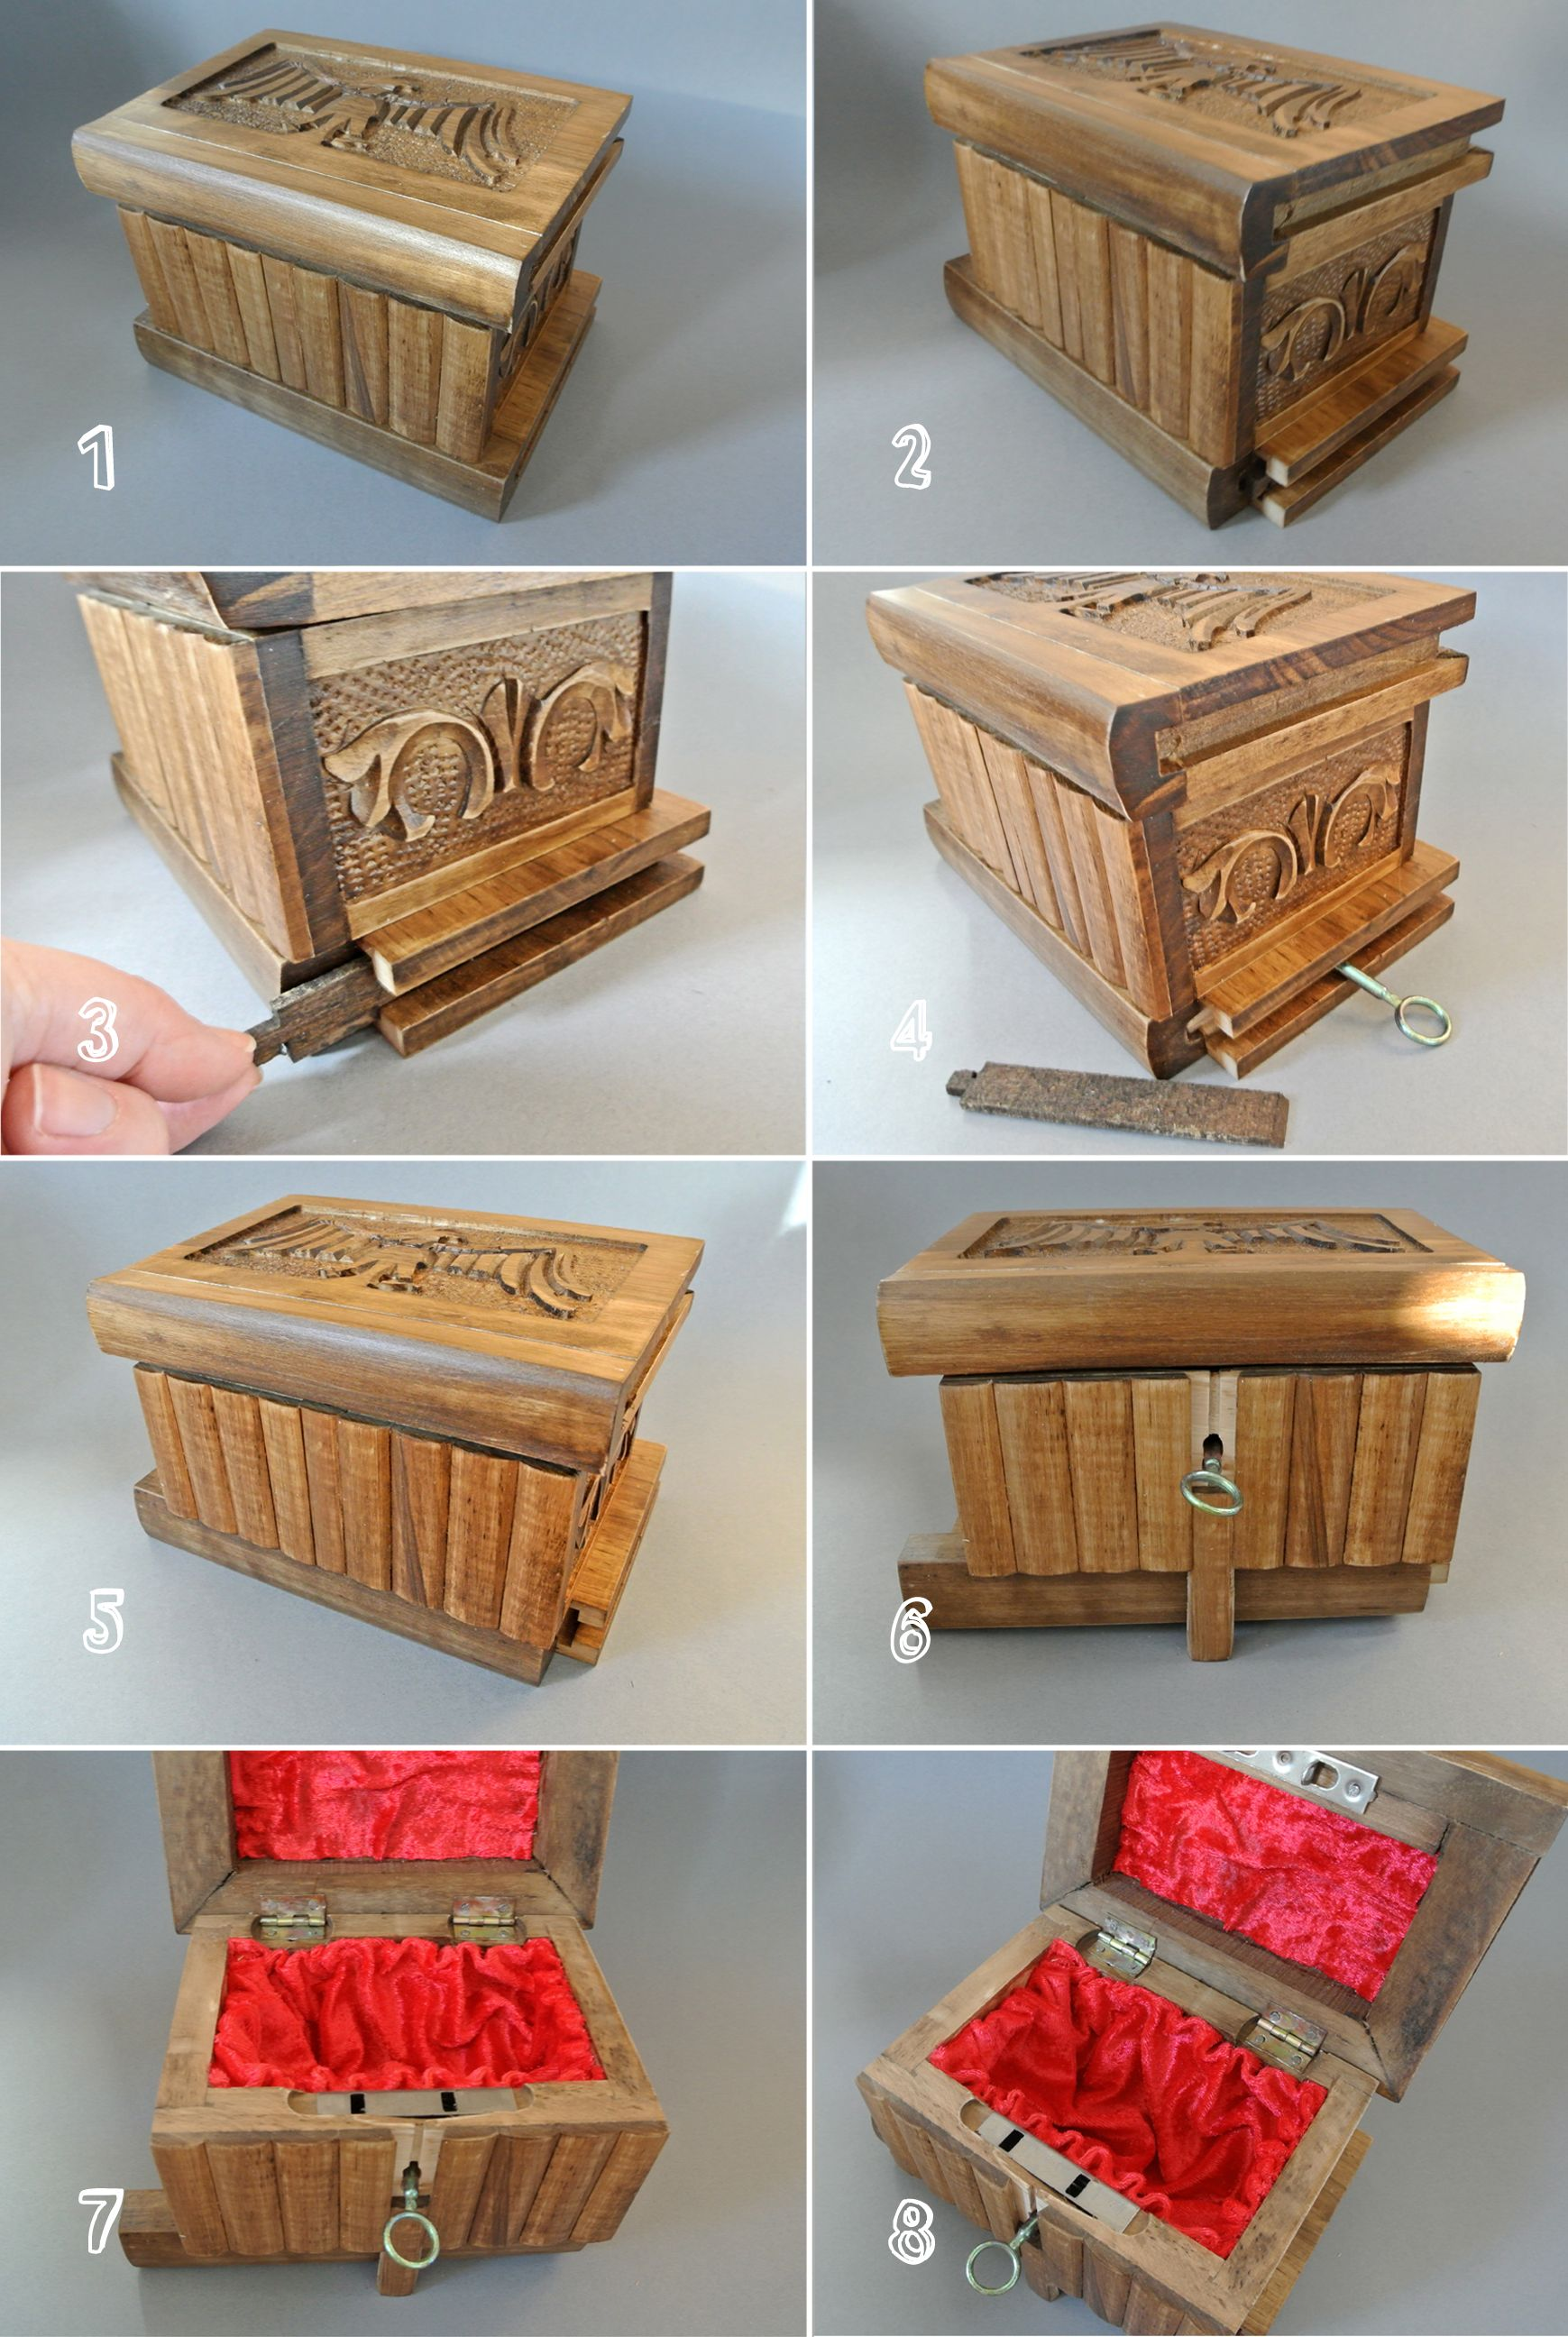 Handmade eagle motif wooden puzzle box magic trick case